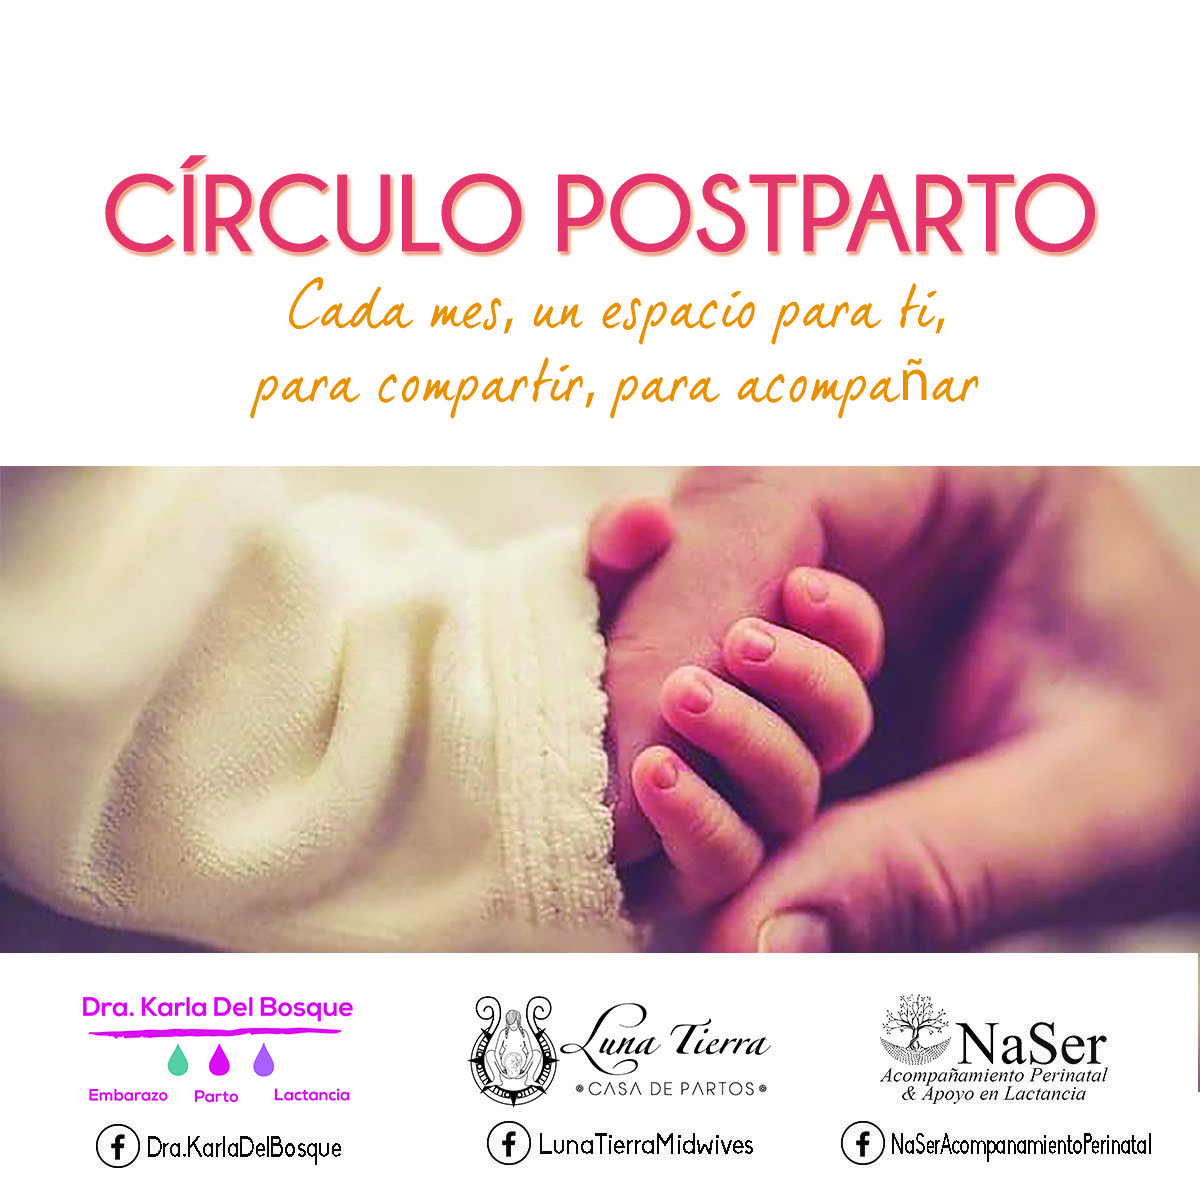 Baby_and_naser_logo.jpg